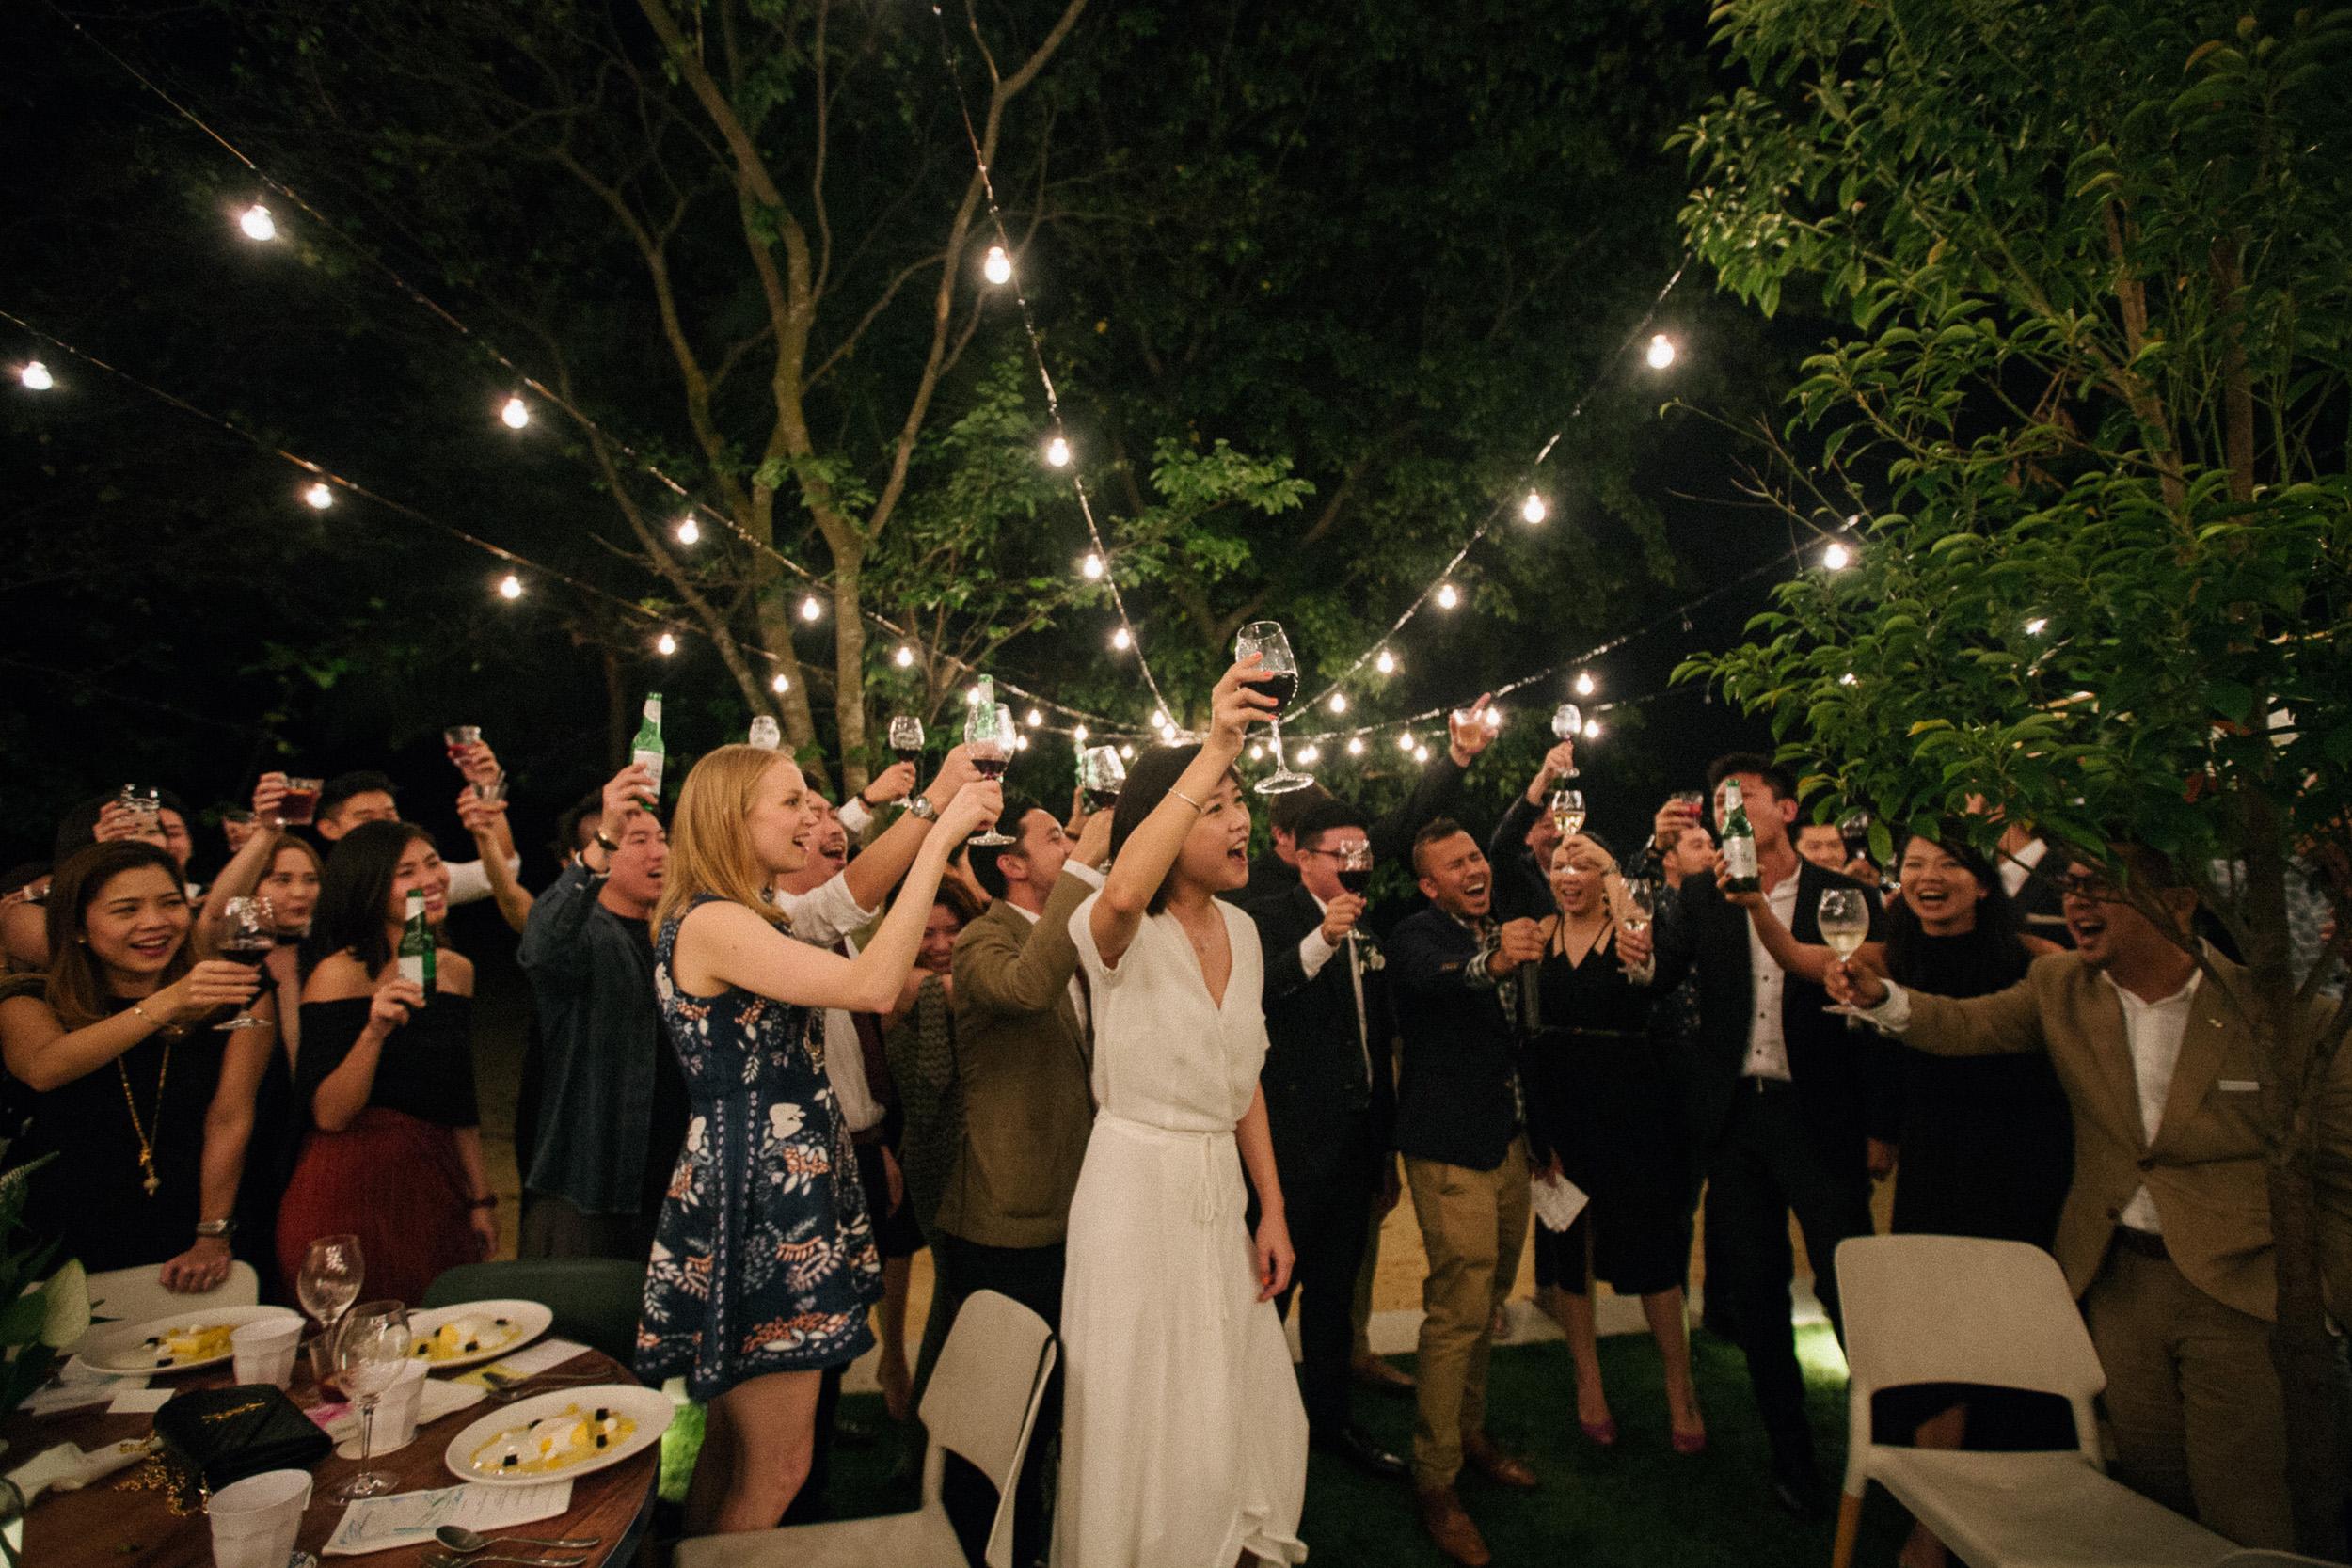 singapore-wedding-photographer-photography-wmt2017-065.jpg